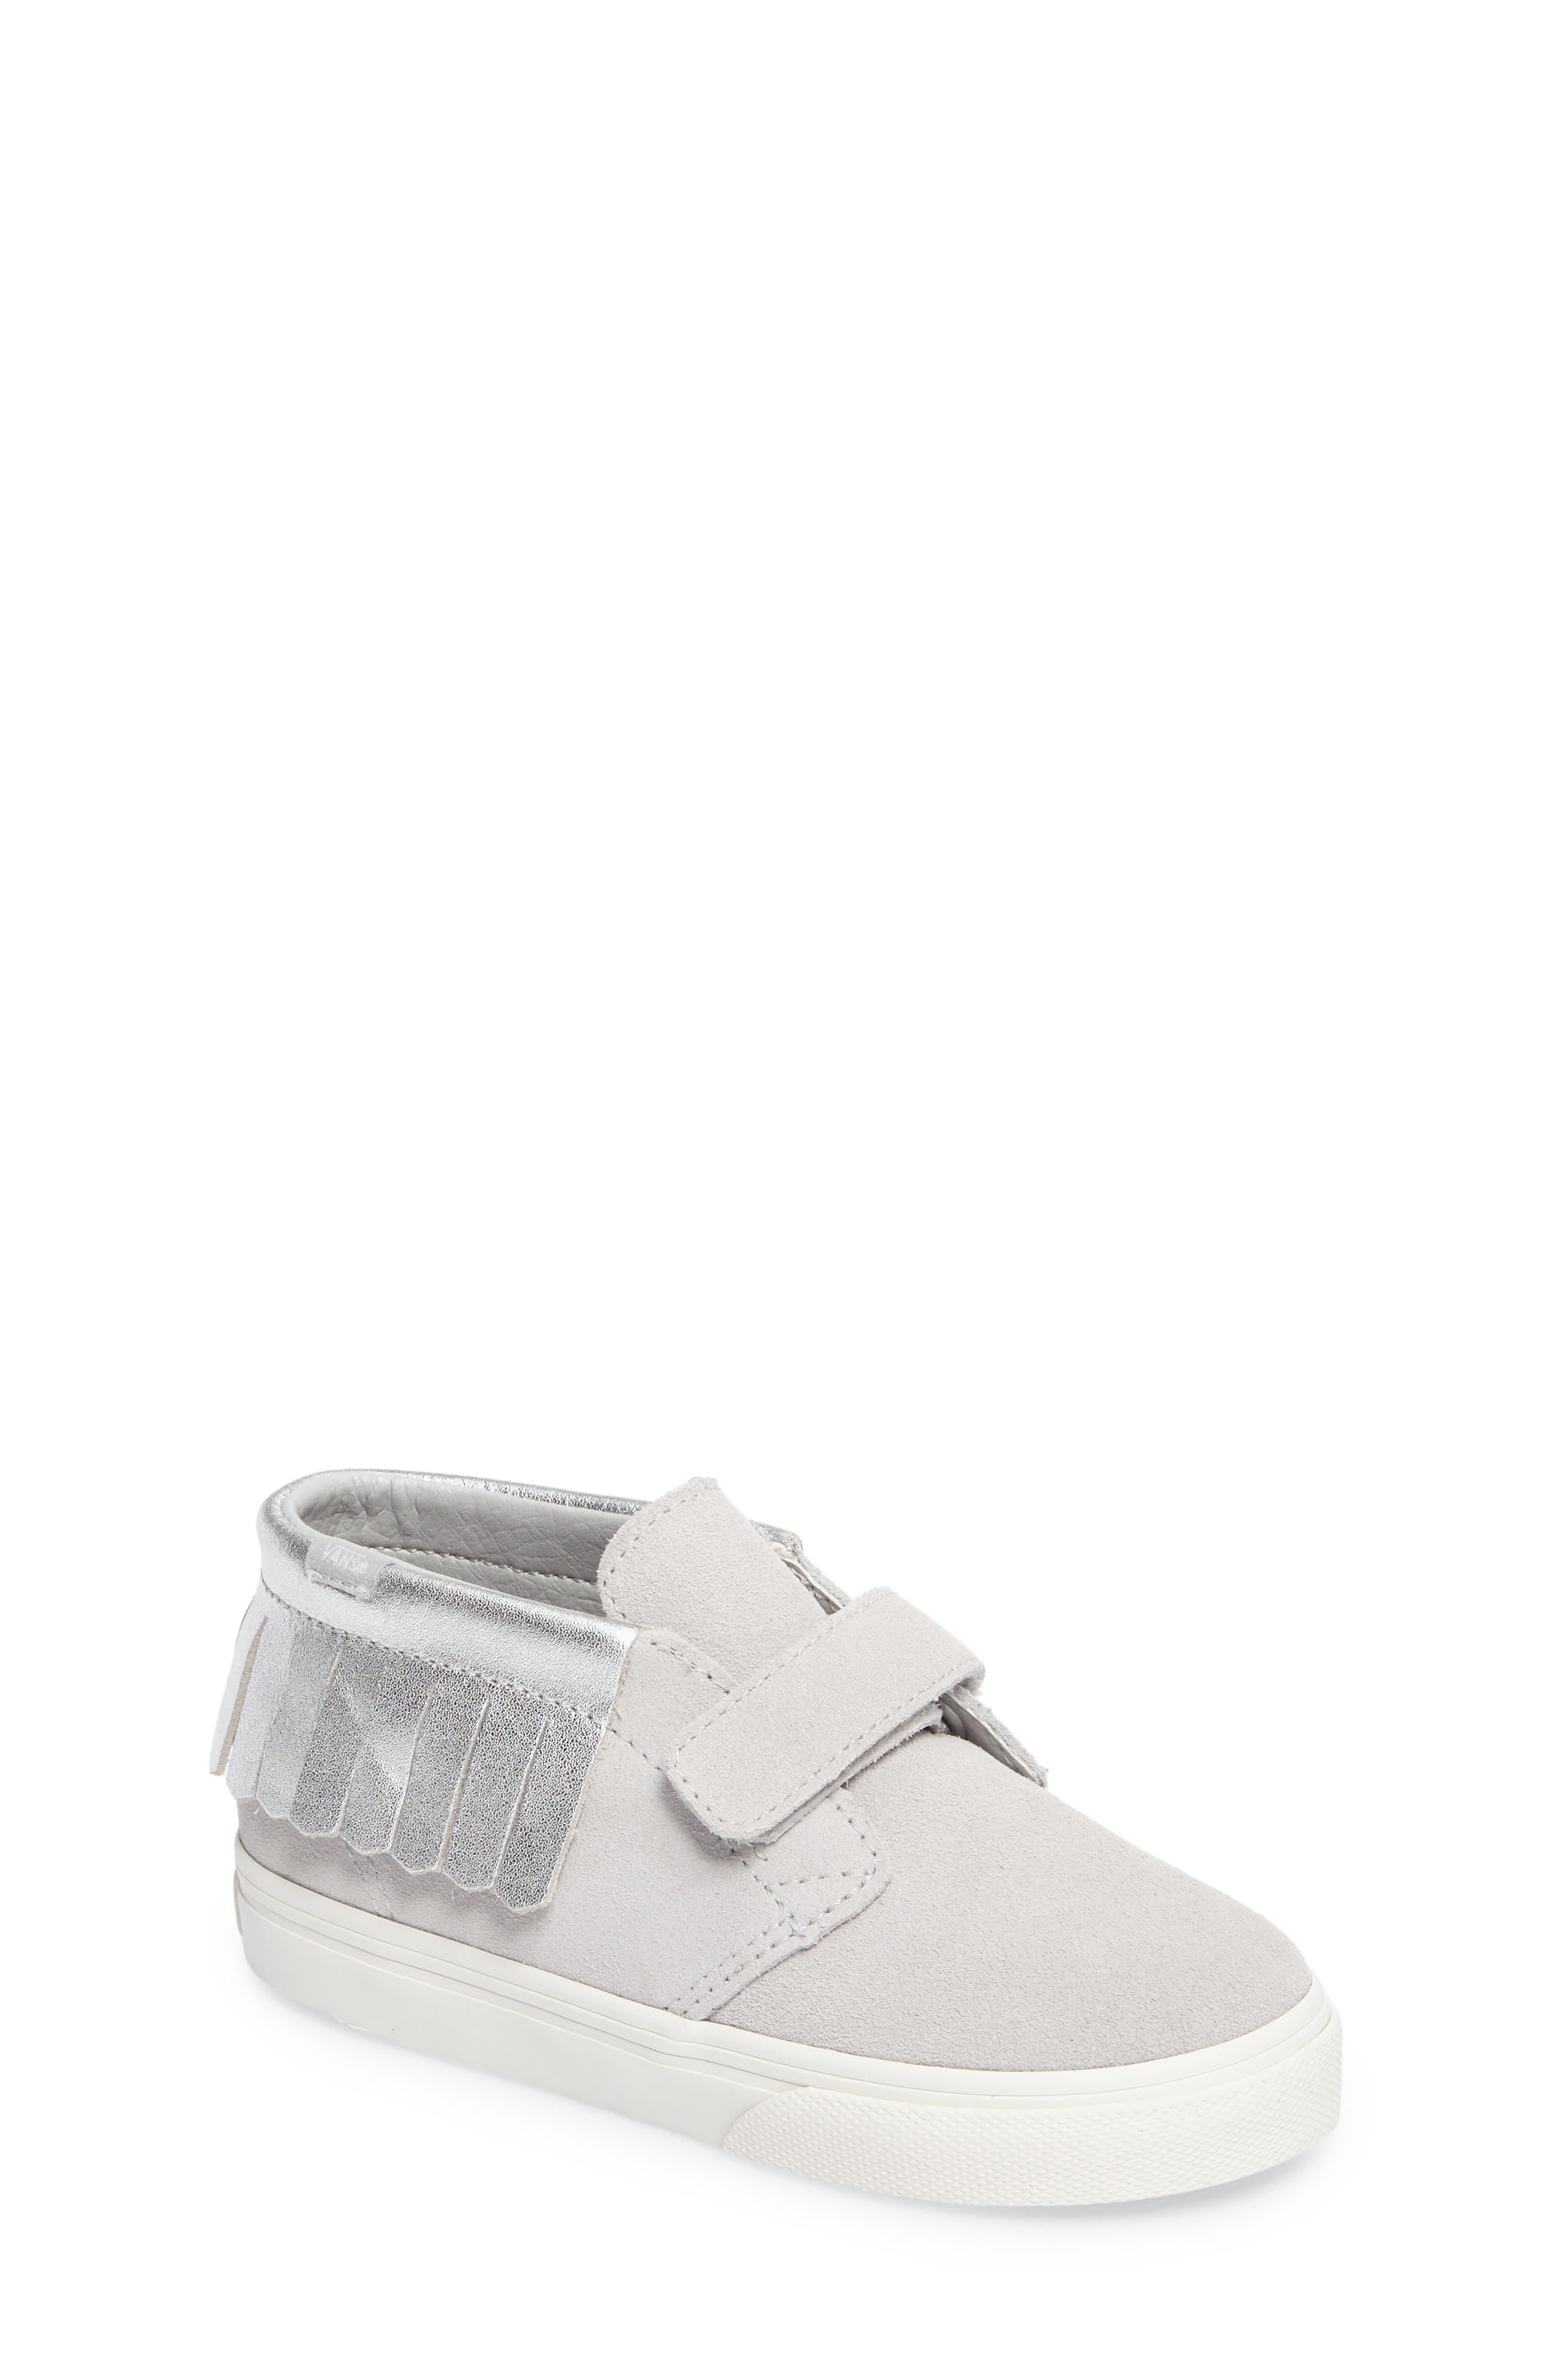 Chukka V Moc Sneaker,                             Main thumbnail 1, color,                             040